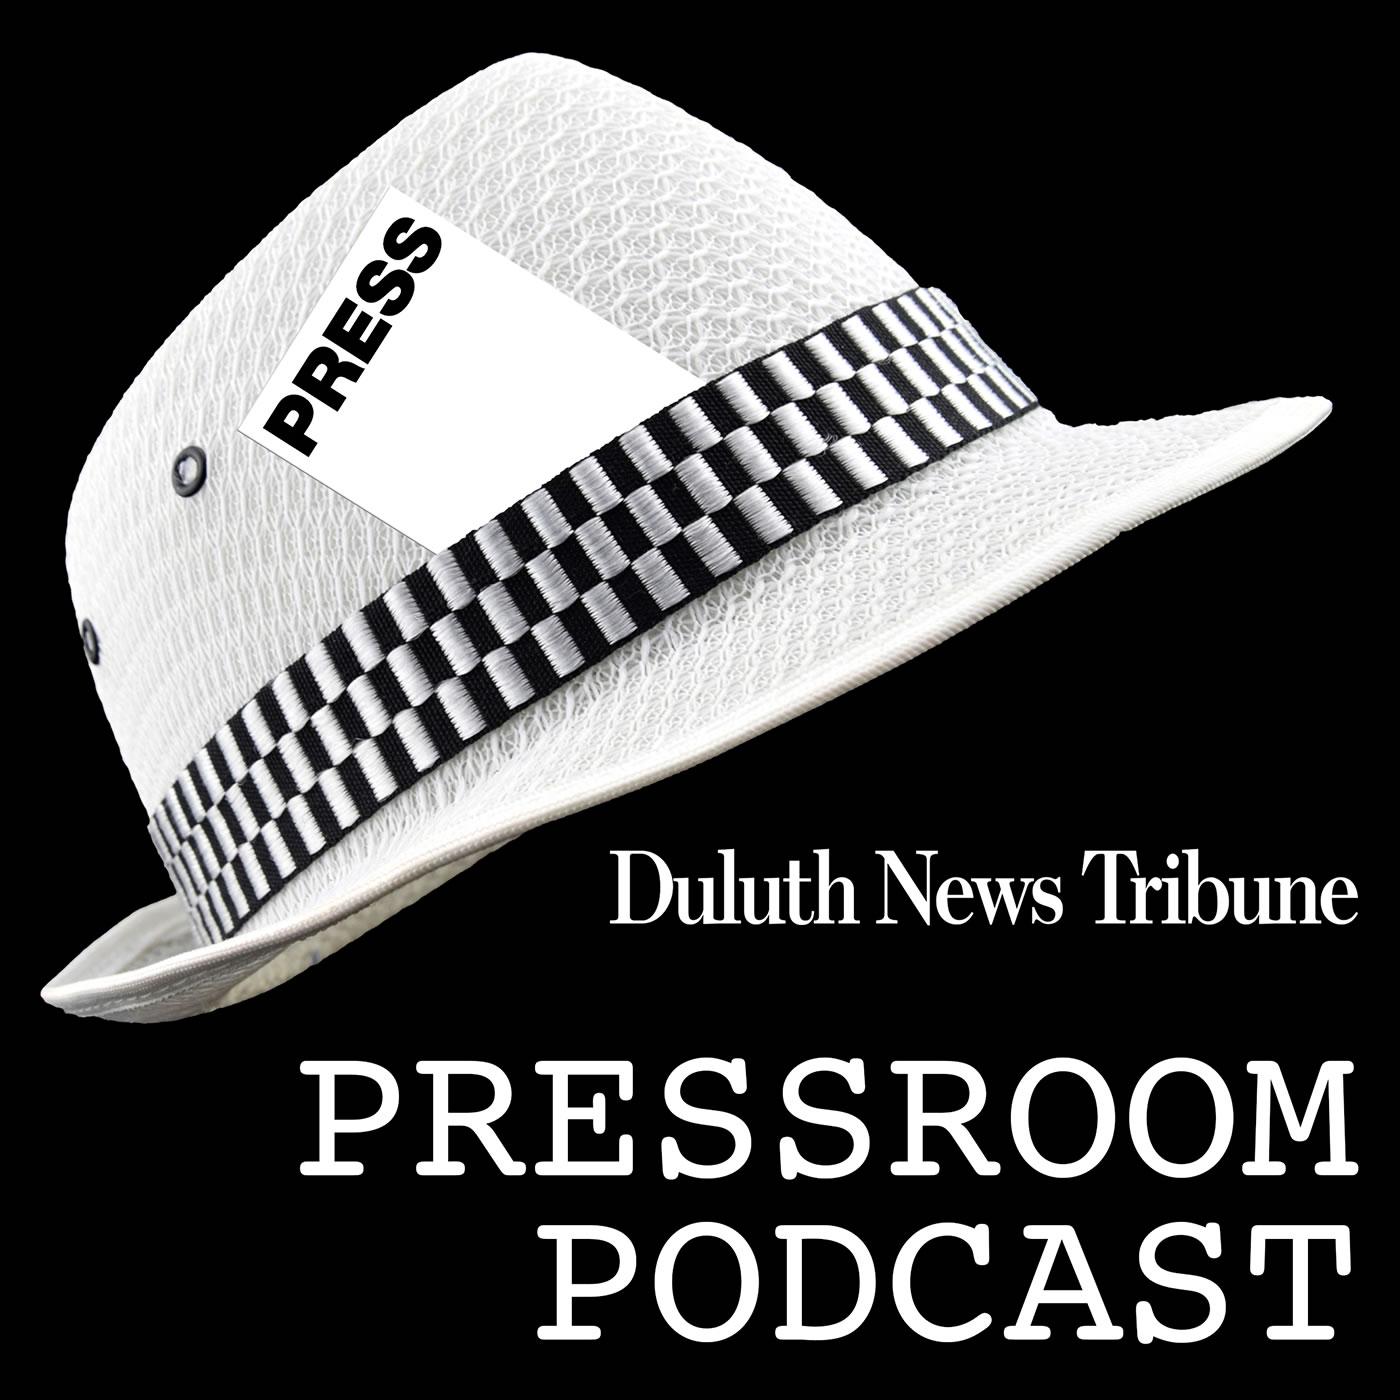 Pressroom Podcast